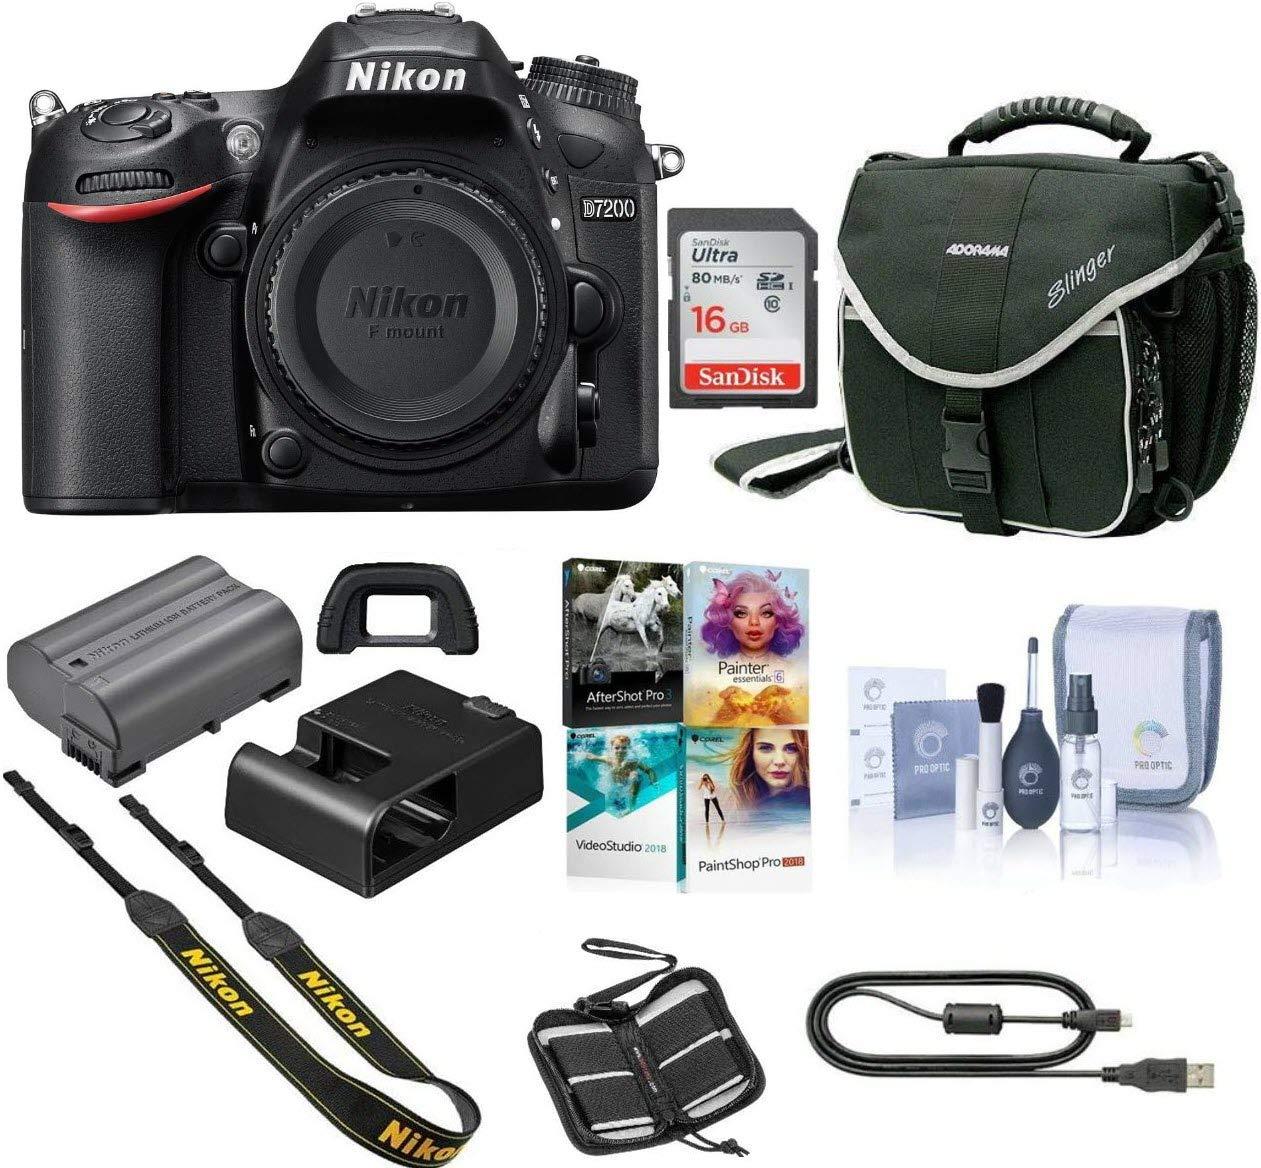 Nikon D7200 DSLR Camera Body O